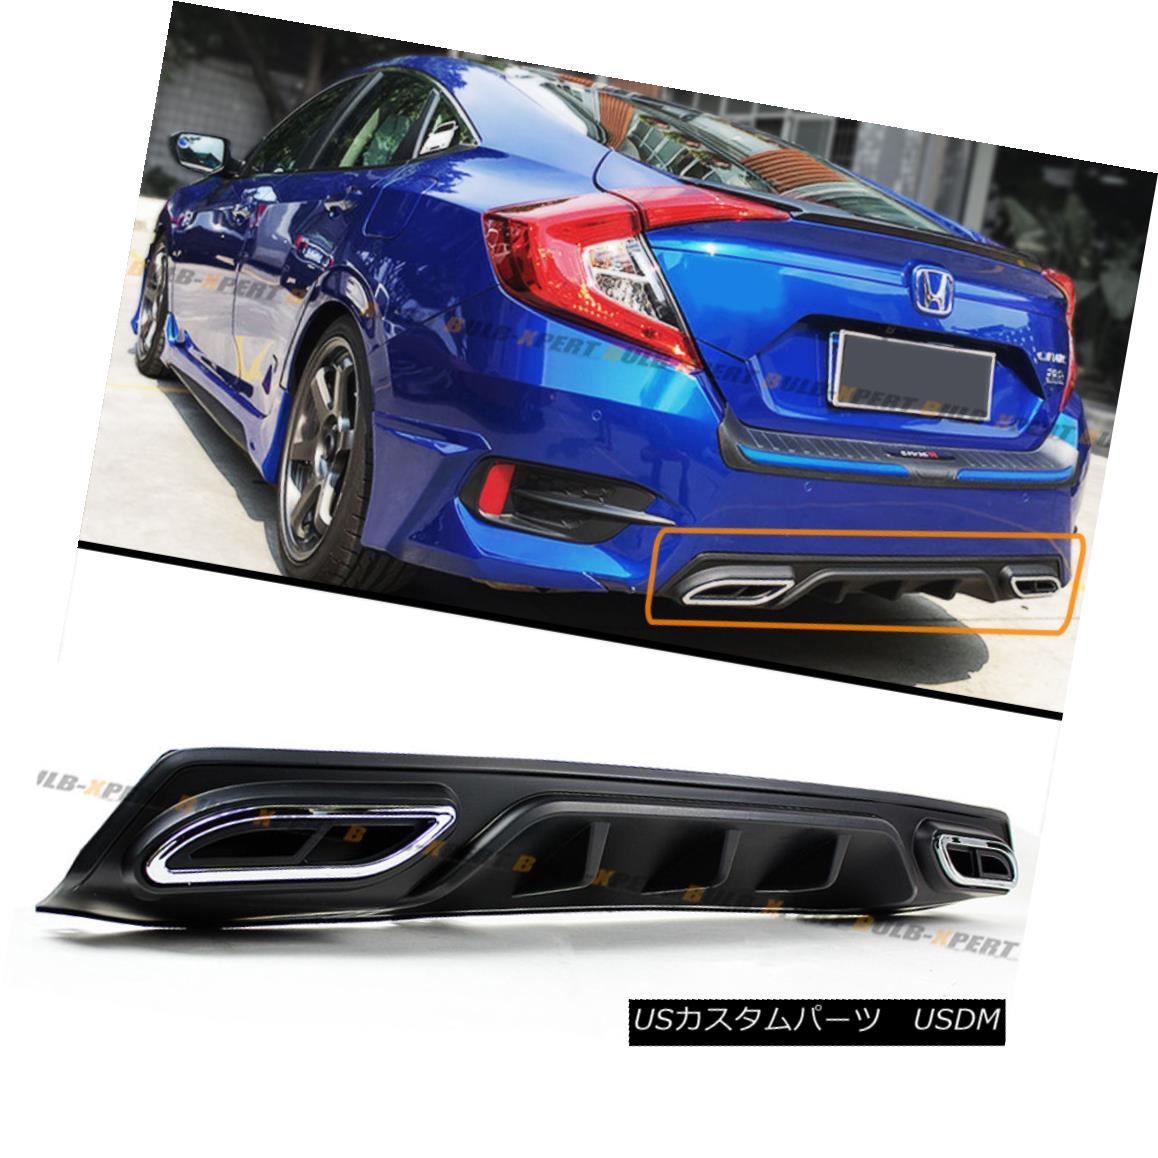 For 2016-18 10th Honda Civic Sedan Rear Bumper Diffuser Fake Exhaust Outlet Tip